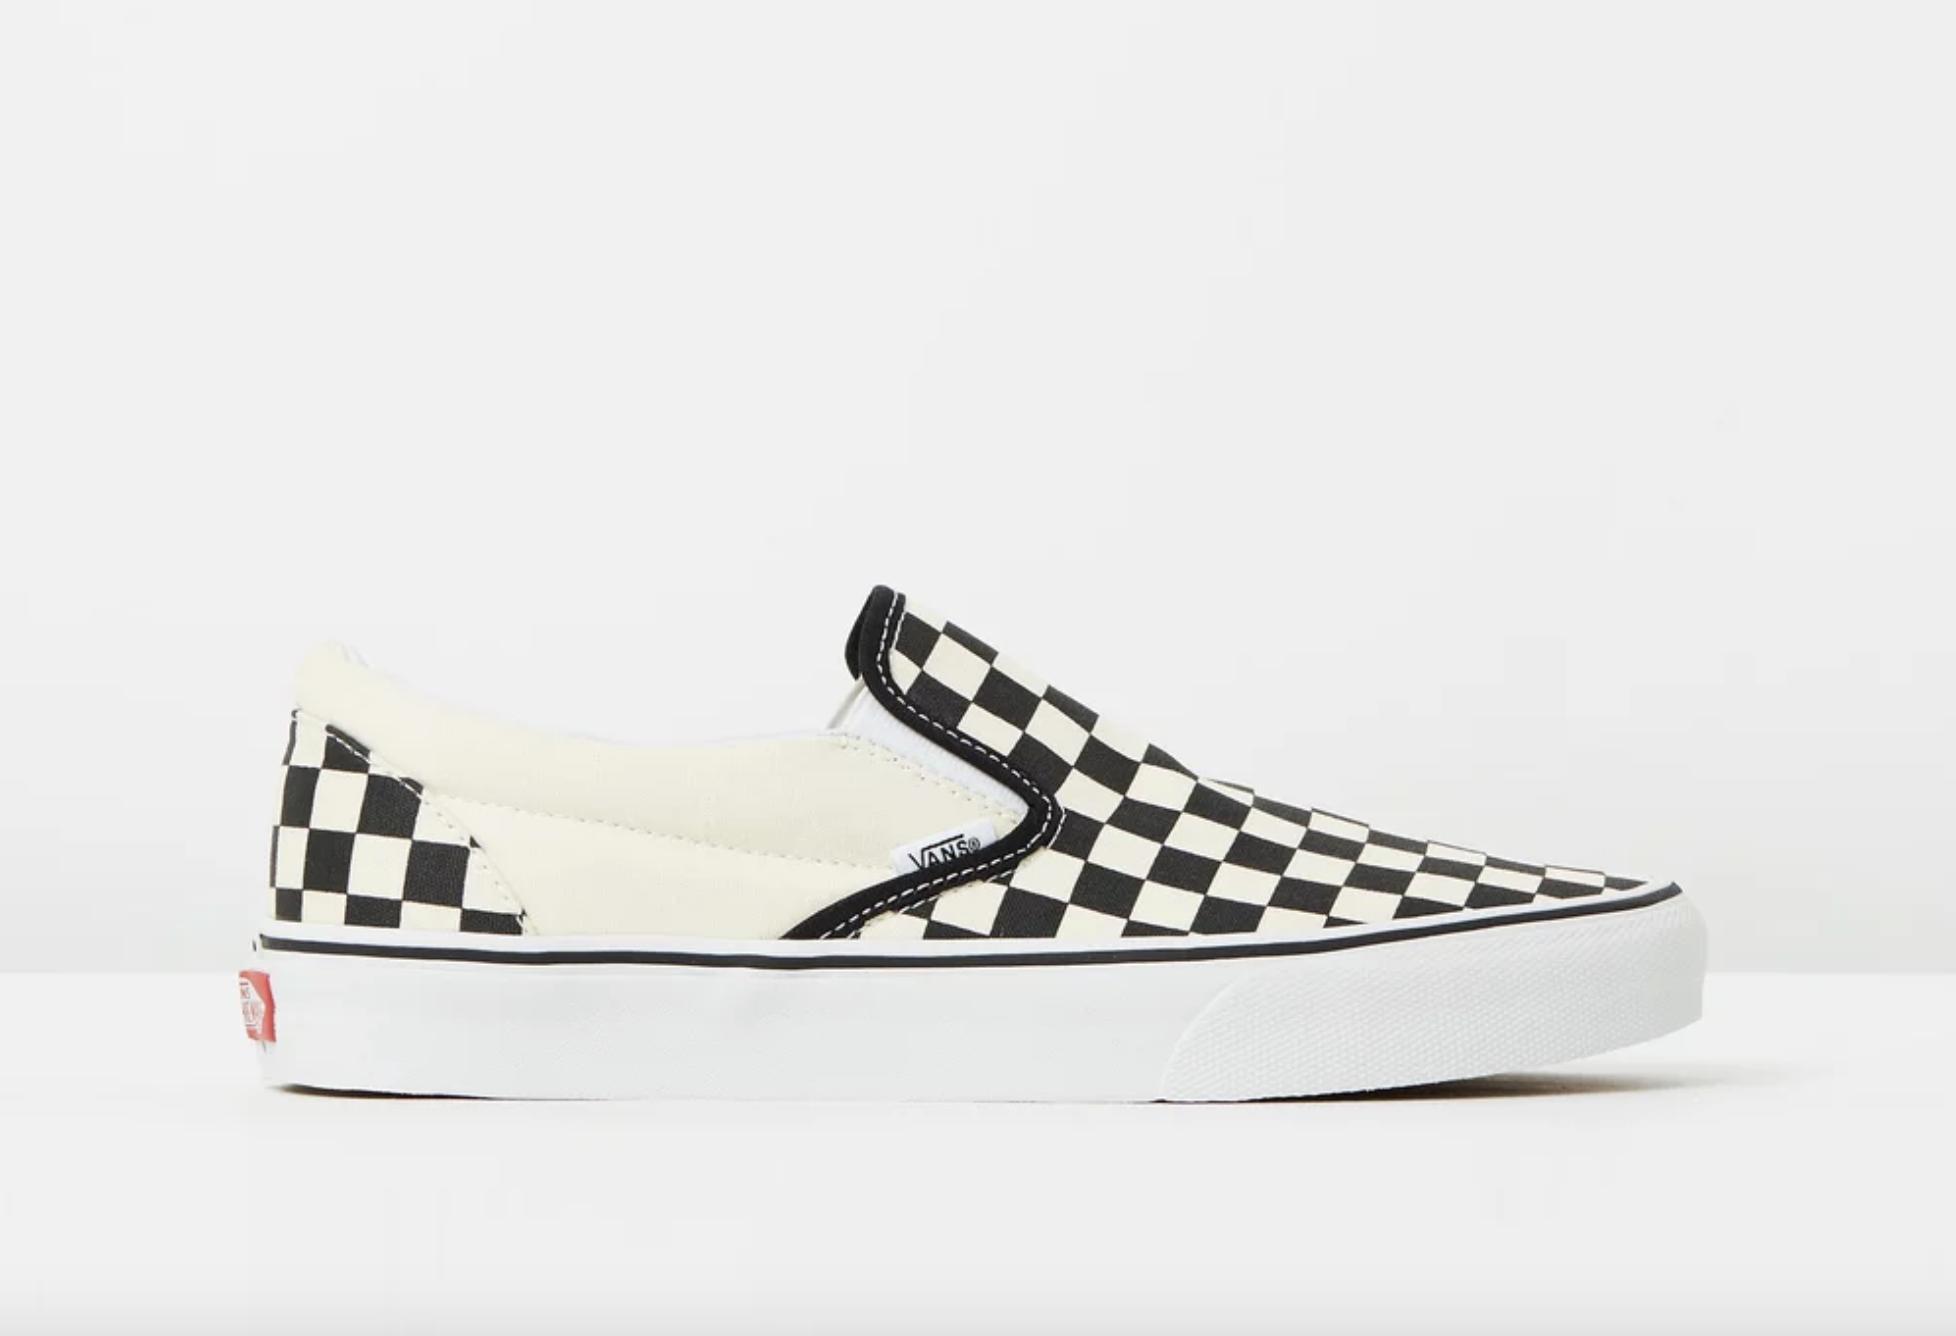 Vans Slip-On Checkerboard